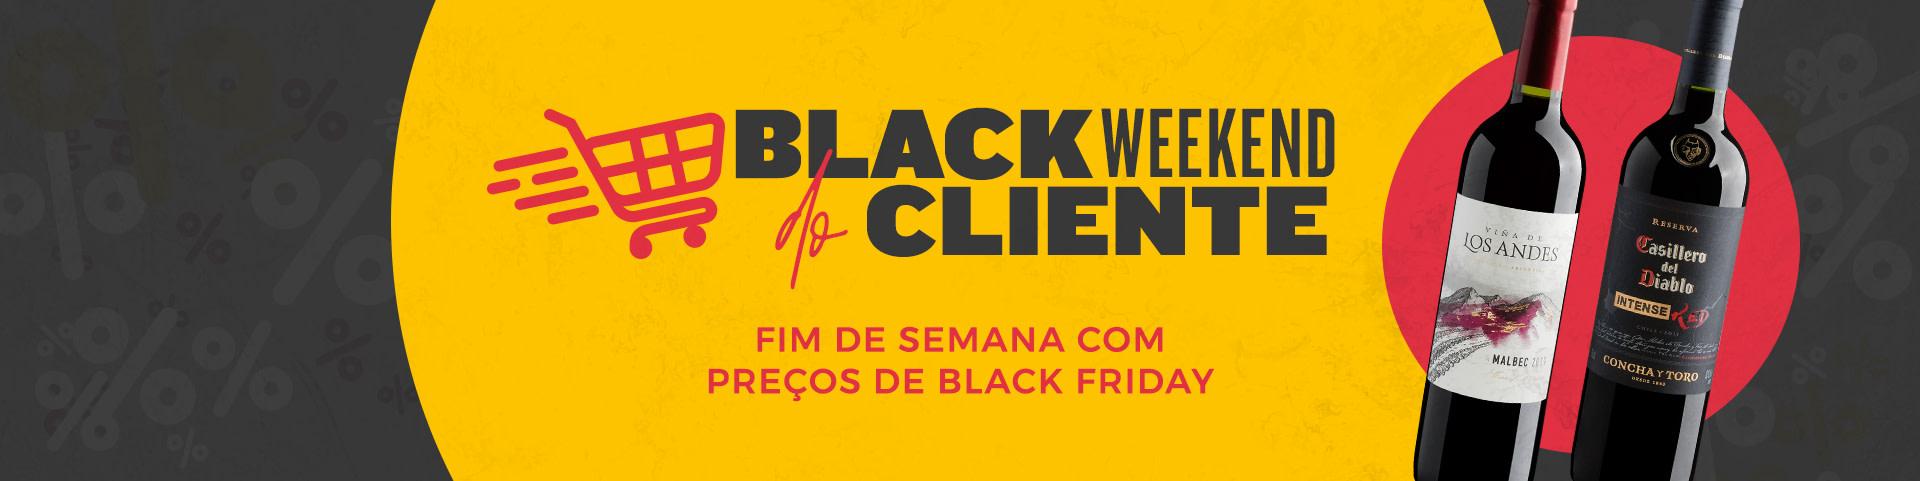 Campanha Black Weekend Cliente